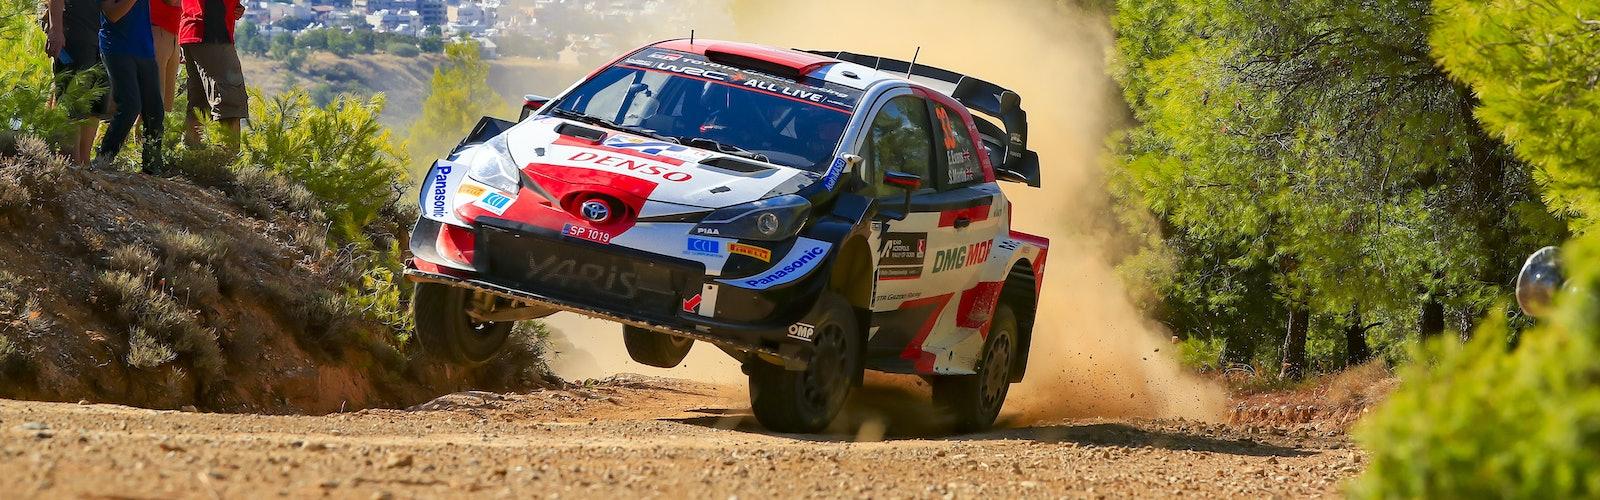 WRC_2021_Rd.9_173